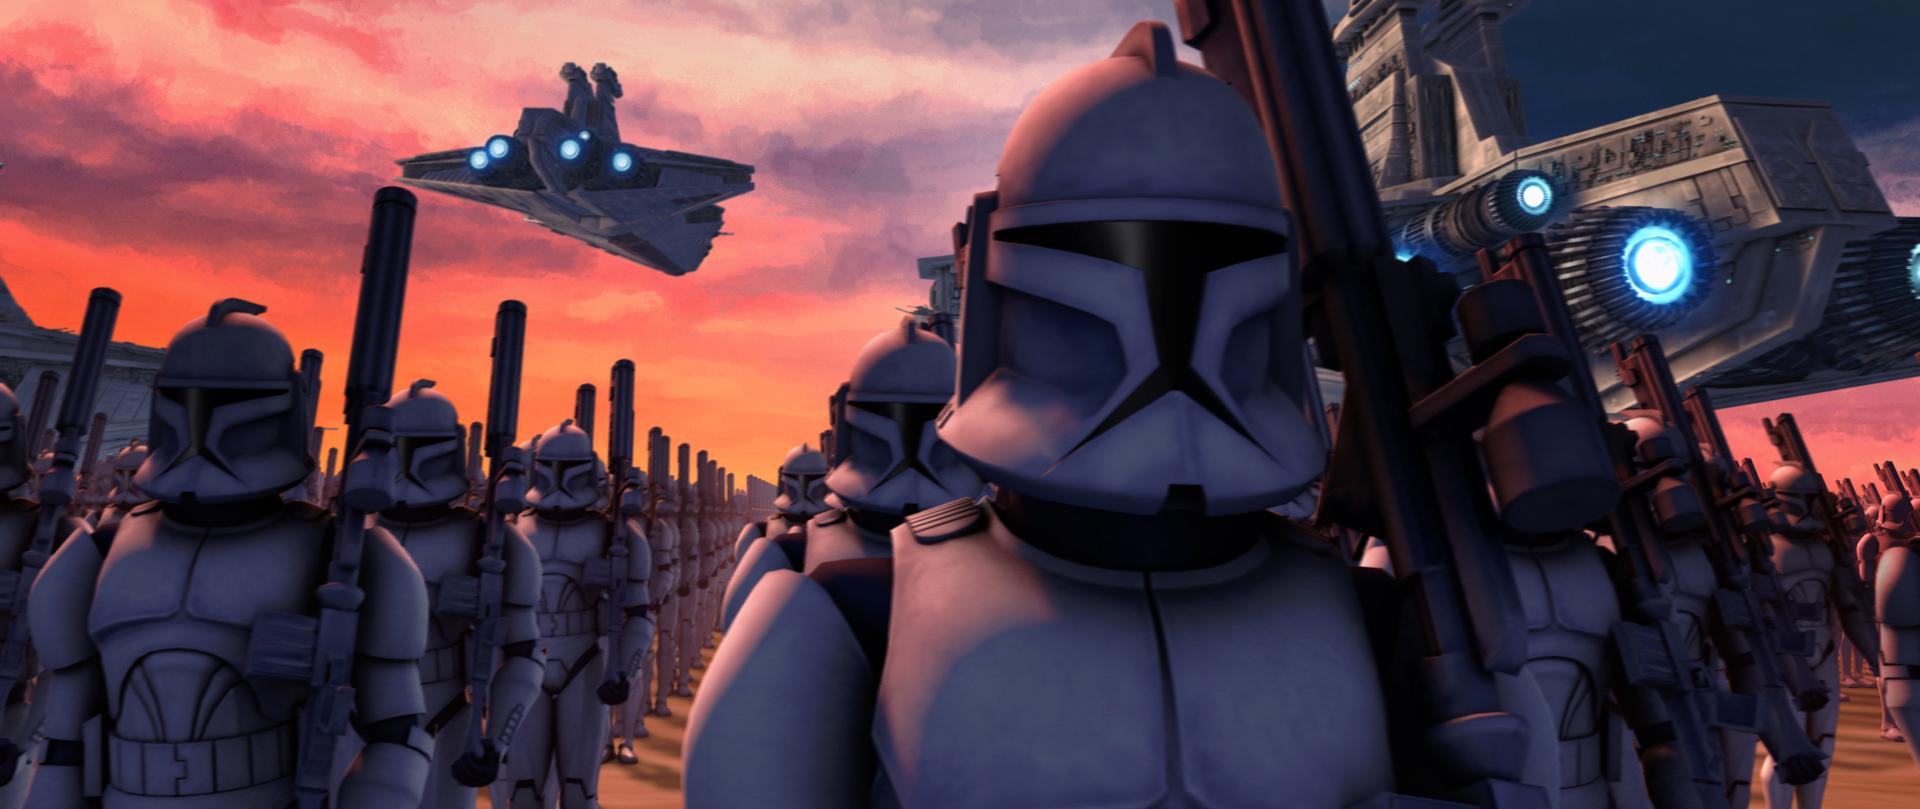 Clone wars clones